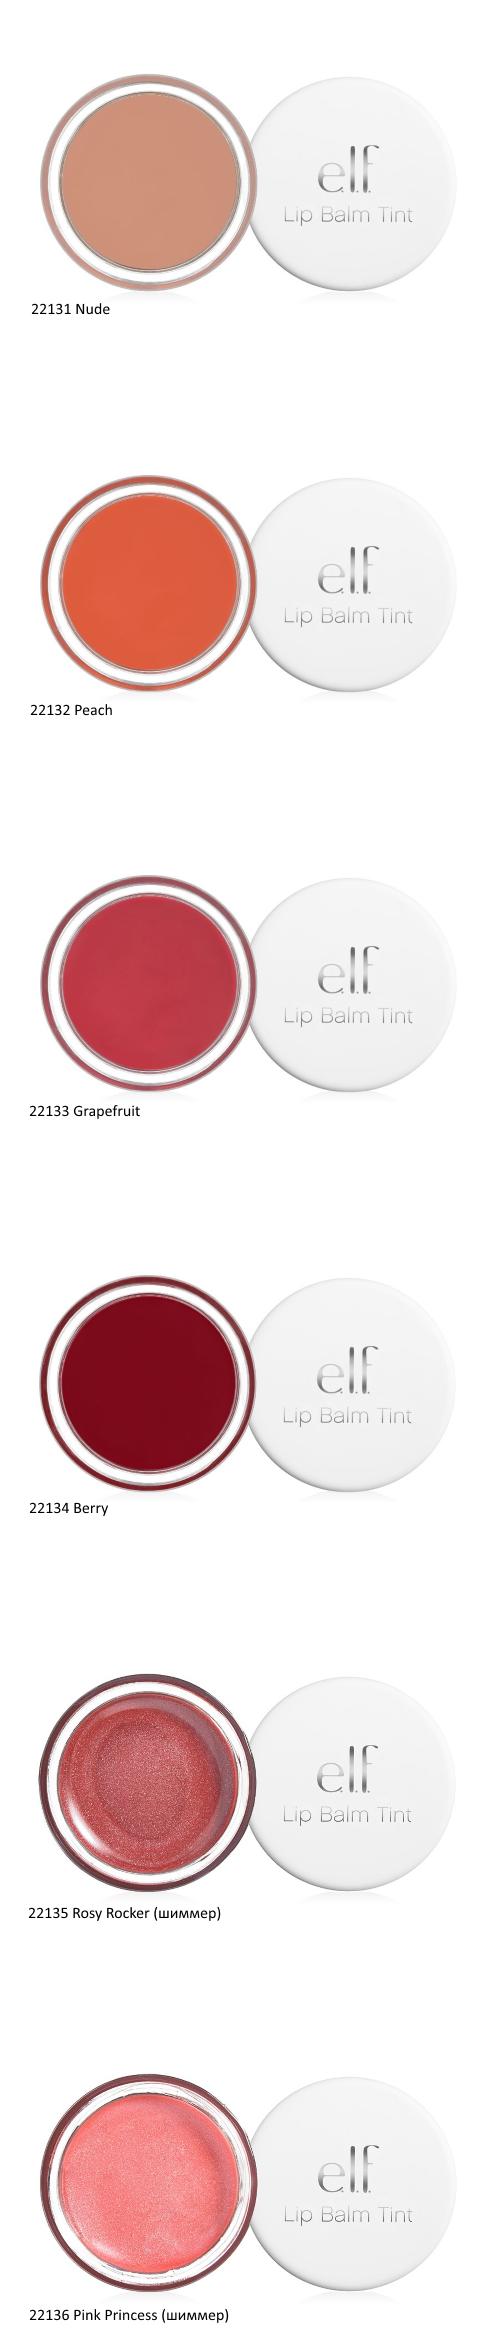 e.l.f. Essential Lip Balm Tint